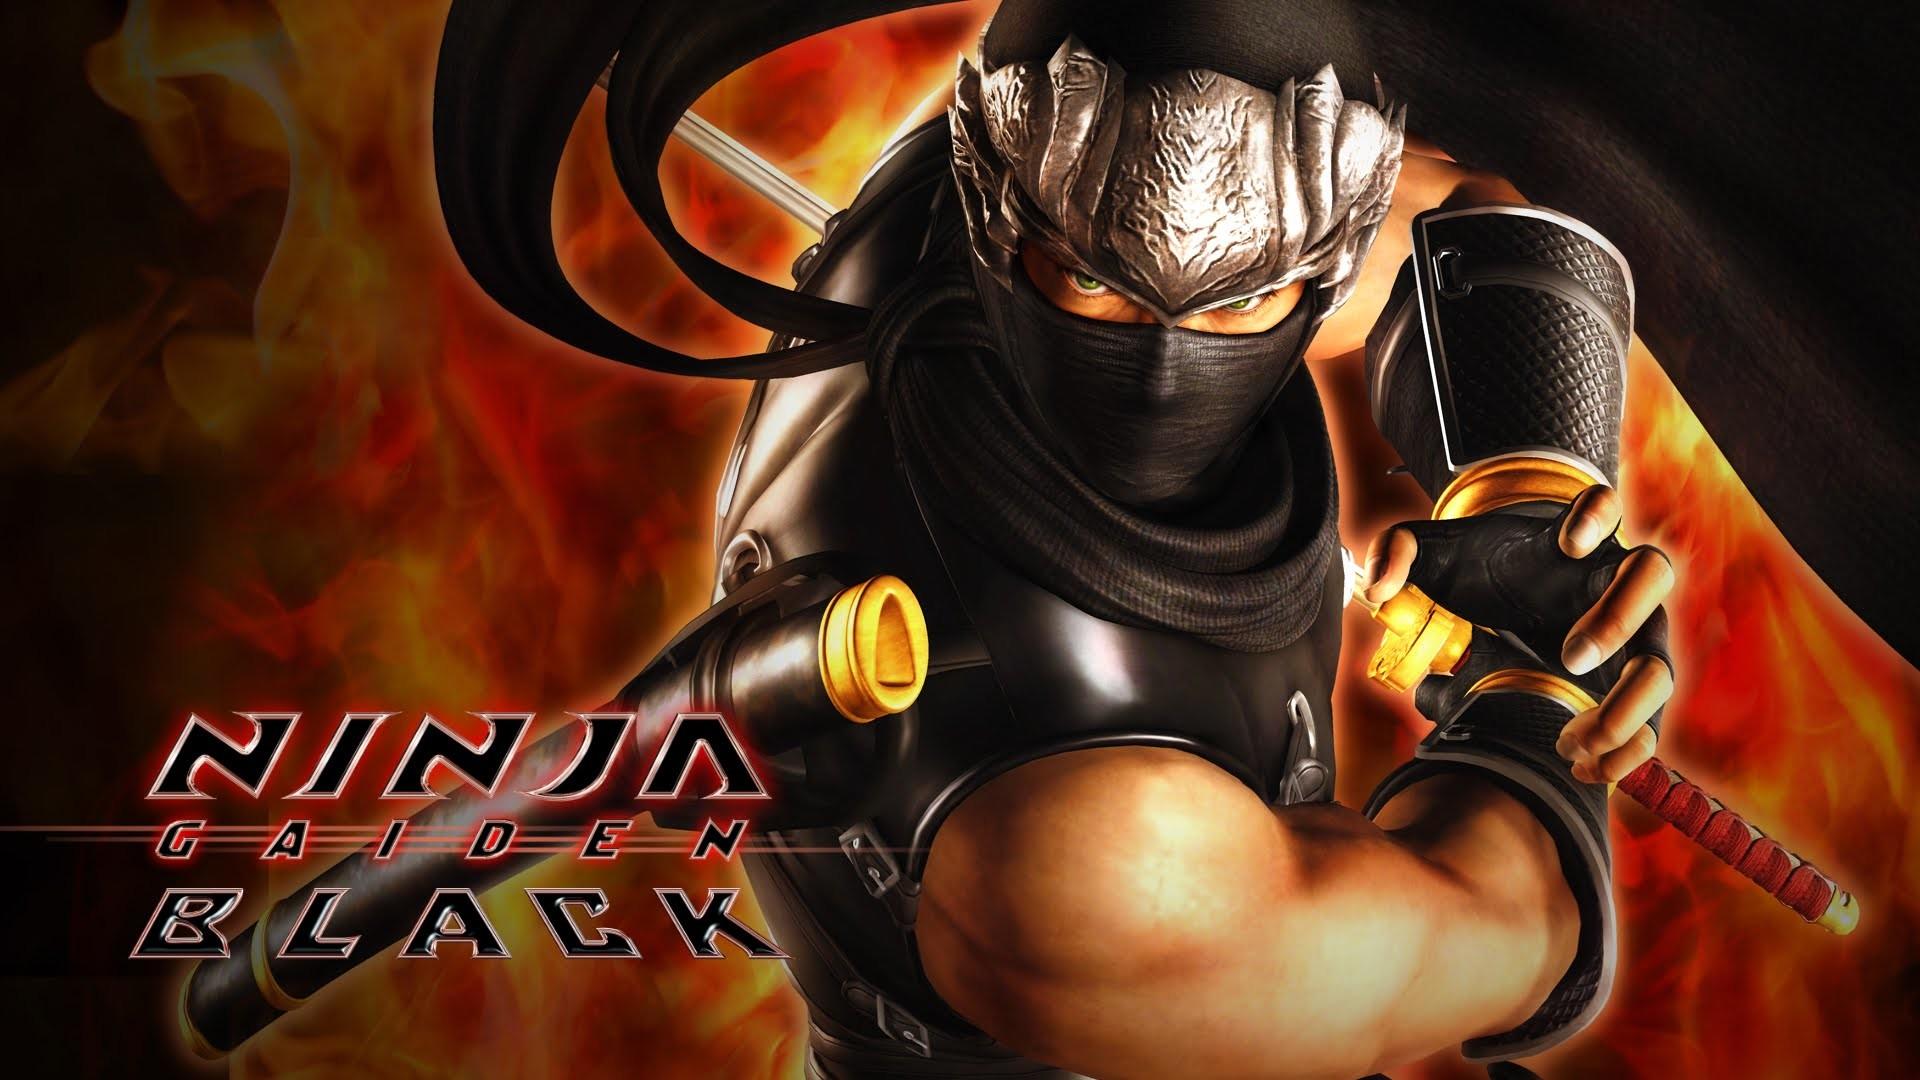 Game Ninja Gaiden Wallpaper: Ninja Gaiden Black Wallpaper ·① WallpaperTag